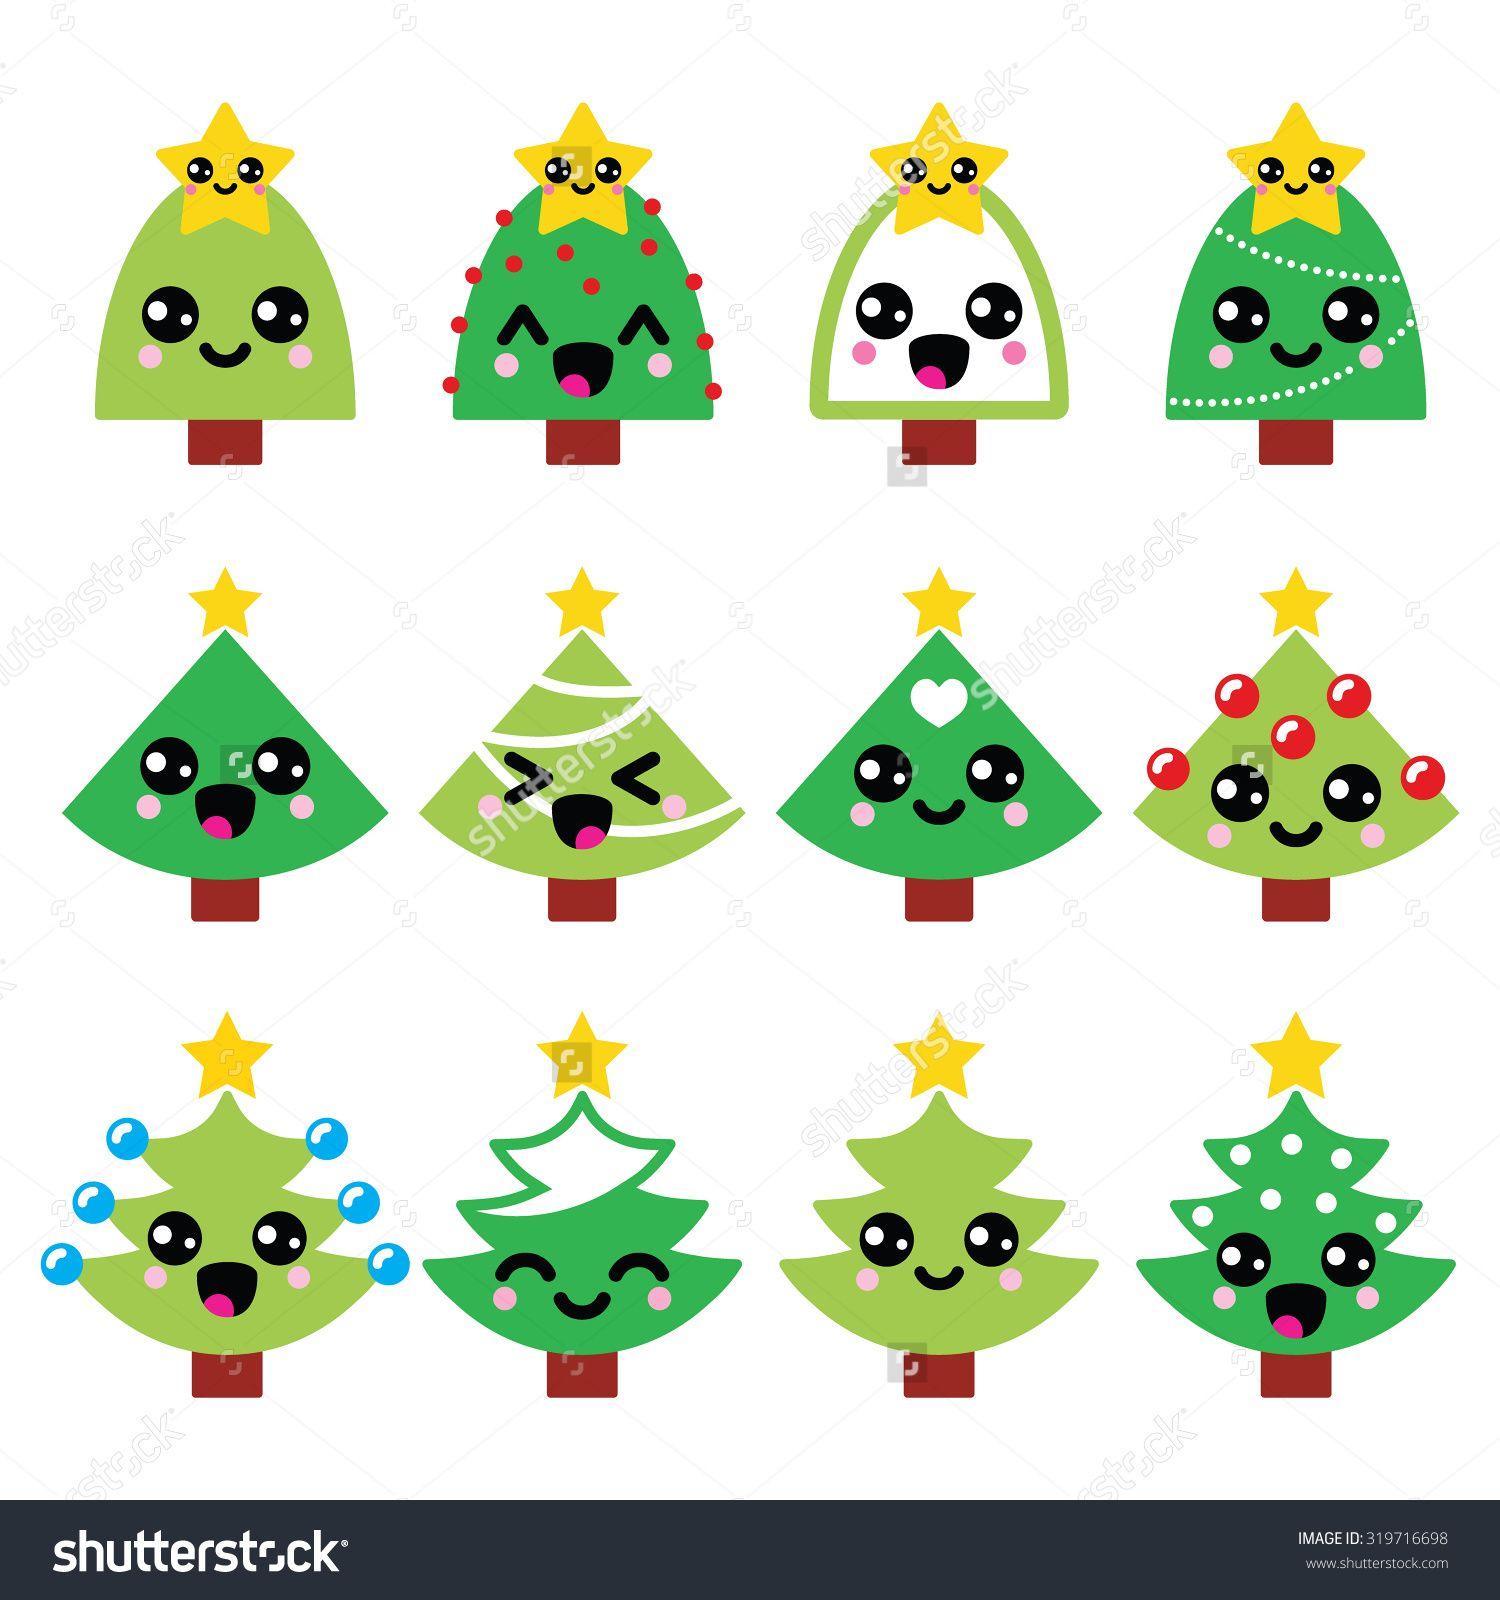 stock-vector-cute-kawaii-christmas-green-tree-with-star-vector ...